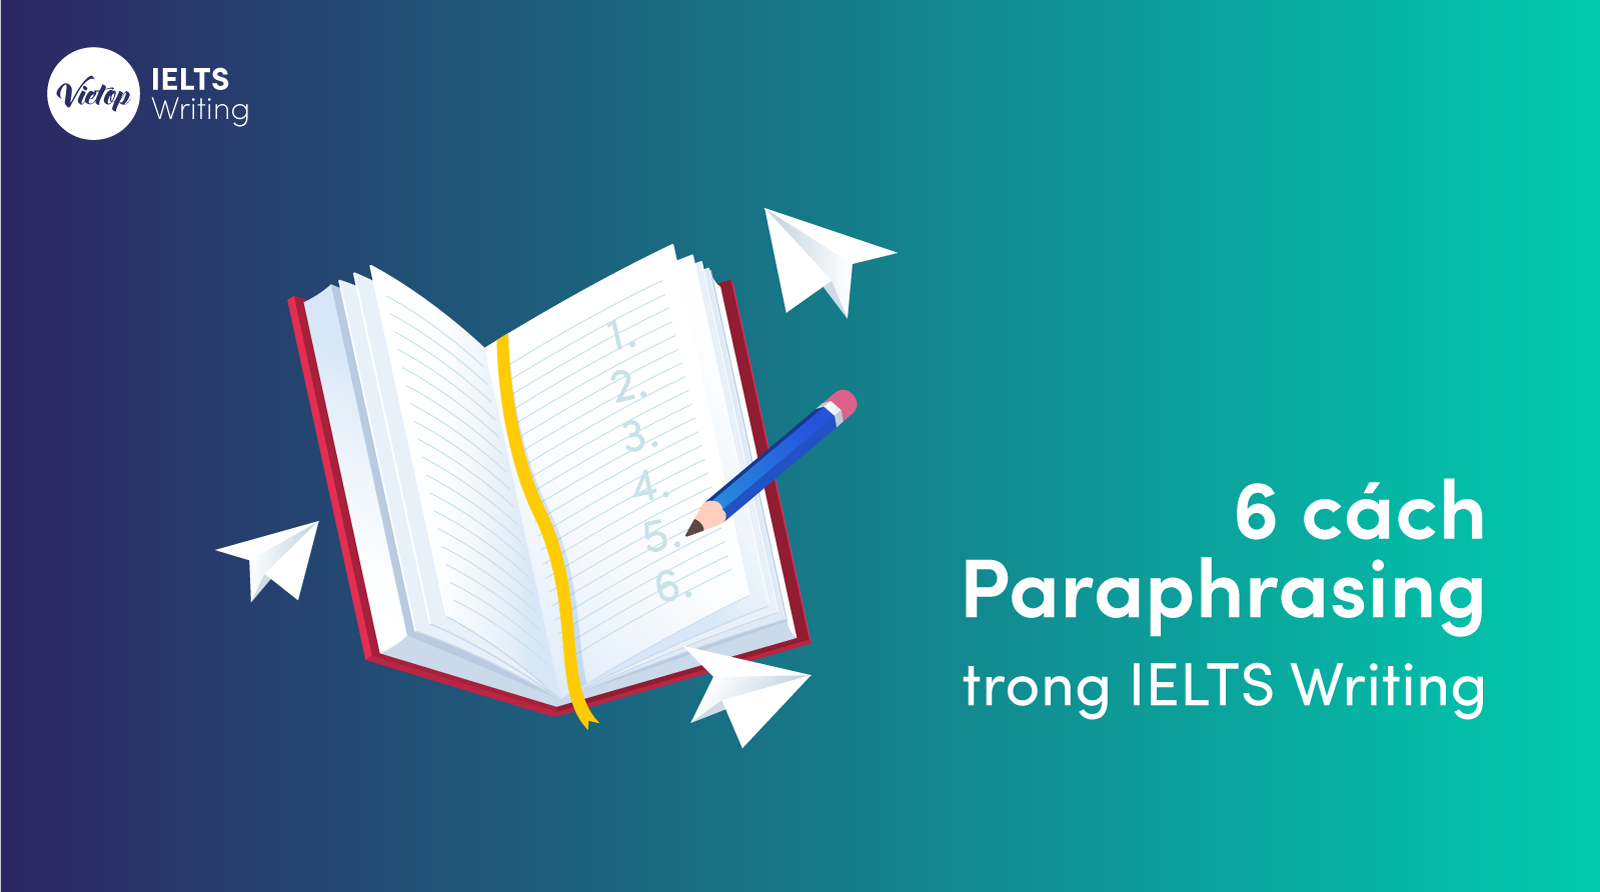 6 Cách Paraphrasing trong IELTS Writing